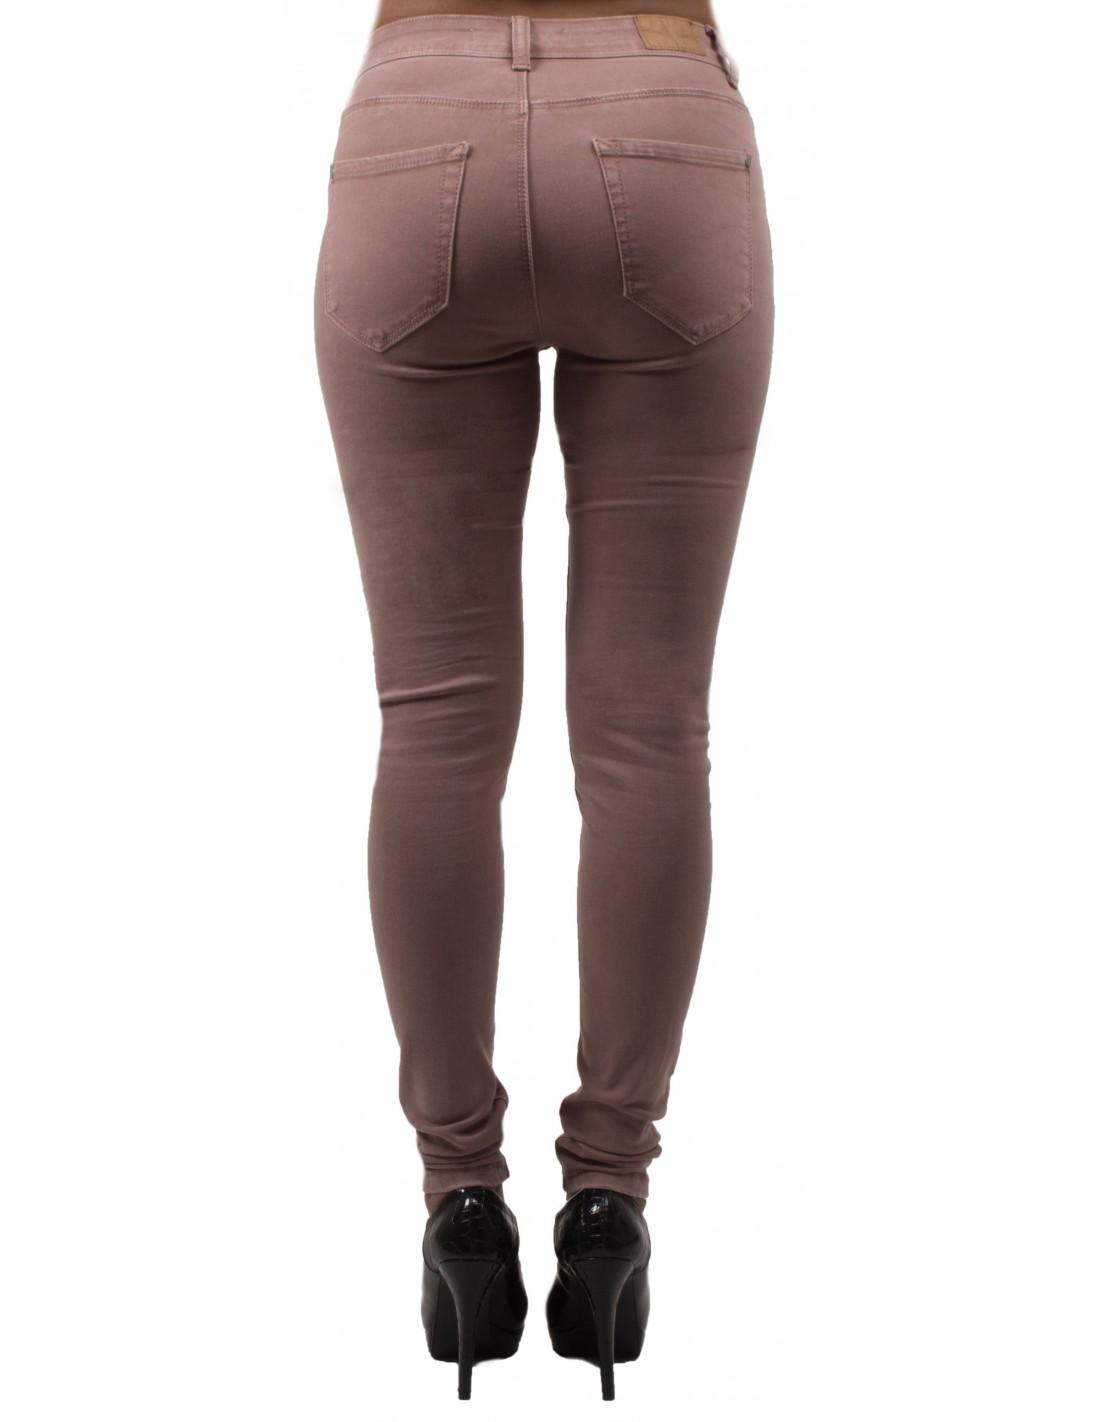 jean slim rose femme taille haute ultra stretch jeaniful. Black Bedroom Furniture Sets. Home Design Ideas